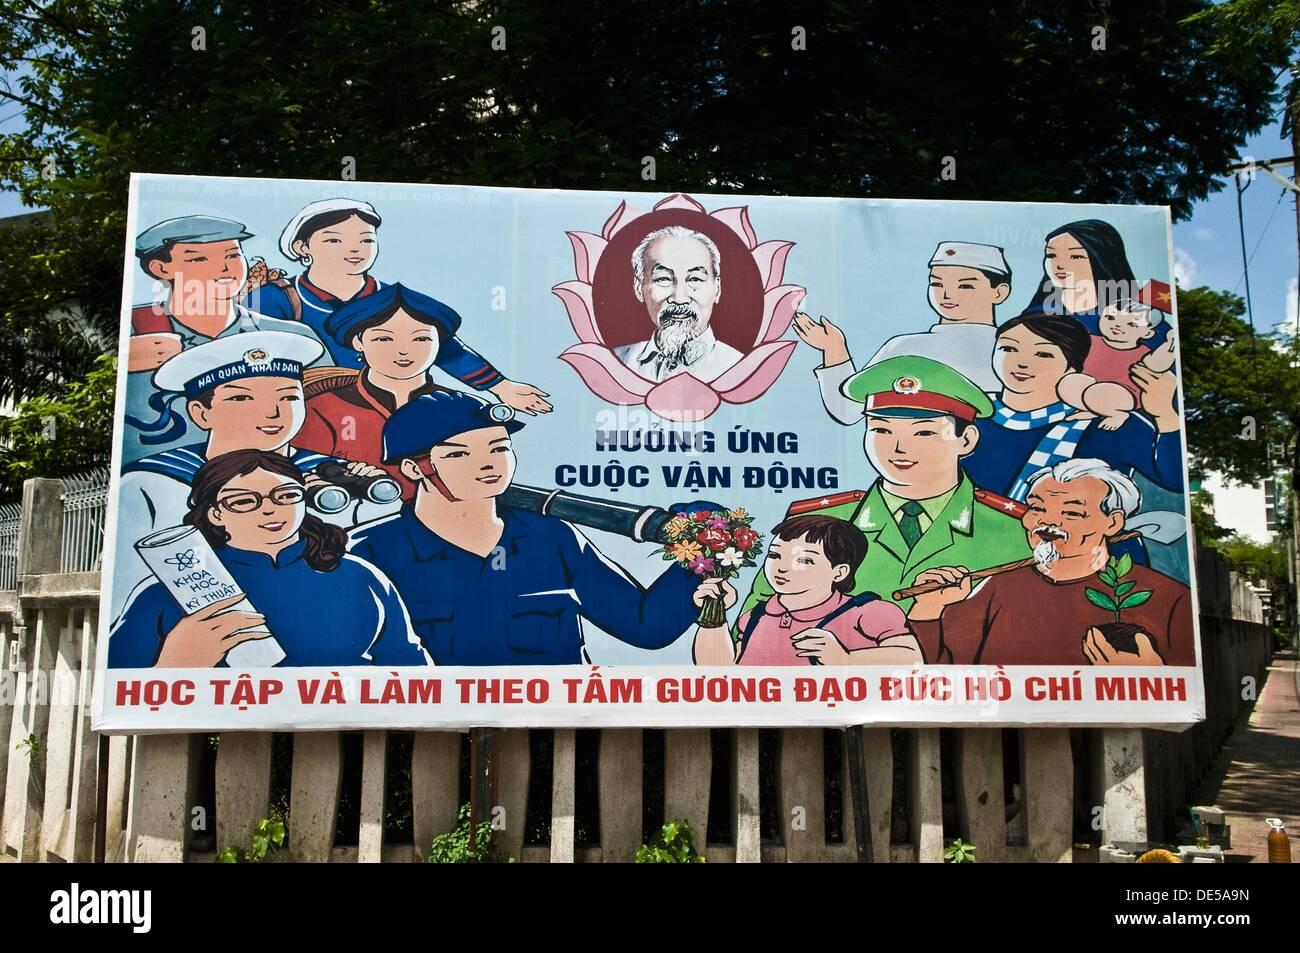 Government propaganda / advertisement for the locals as seen in Saigon, Vietnam. - Stock Image